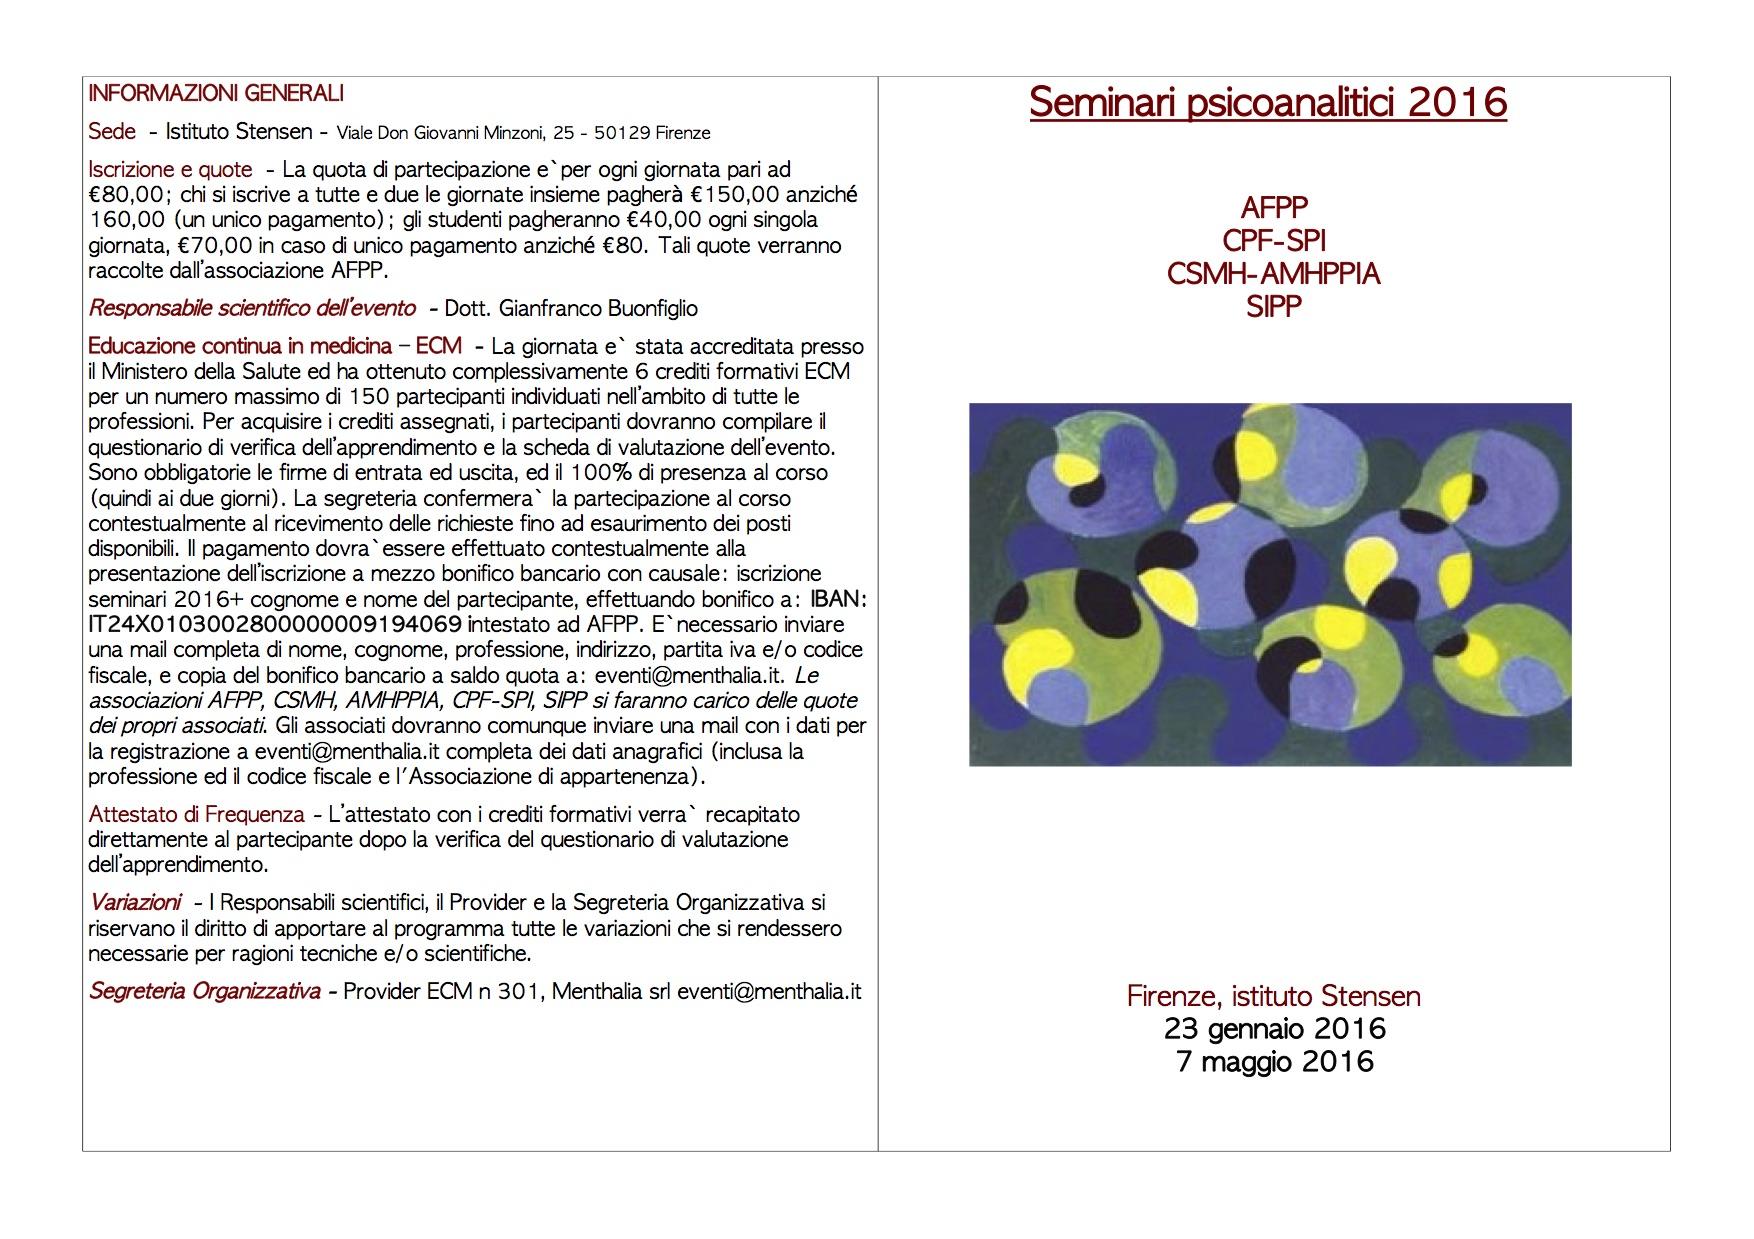 pdf interassociativi 2016